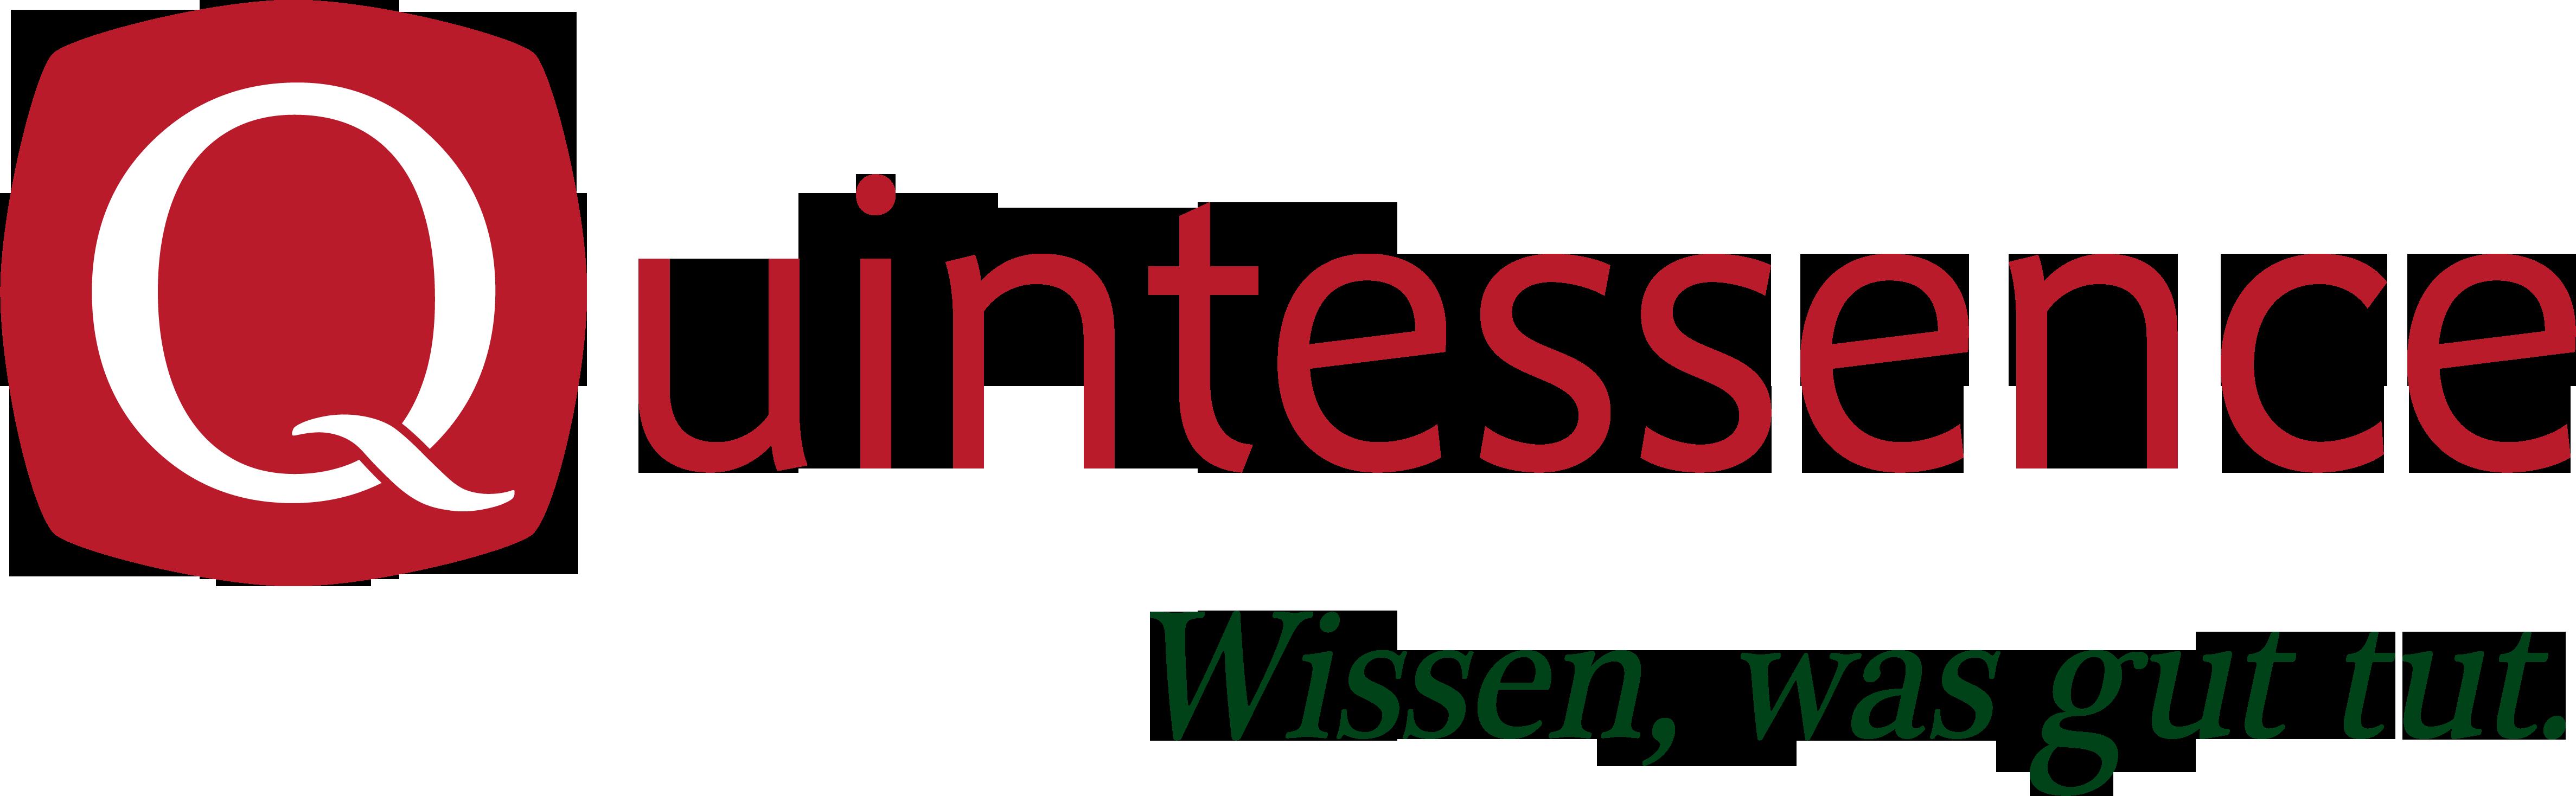 quintessence-naturprodukte-logo